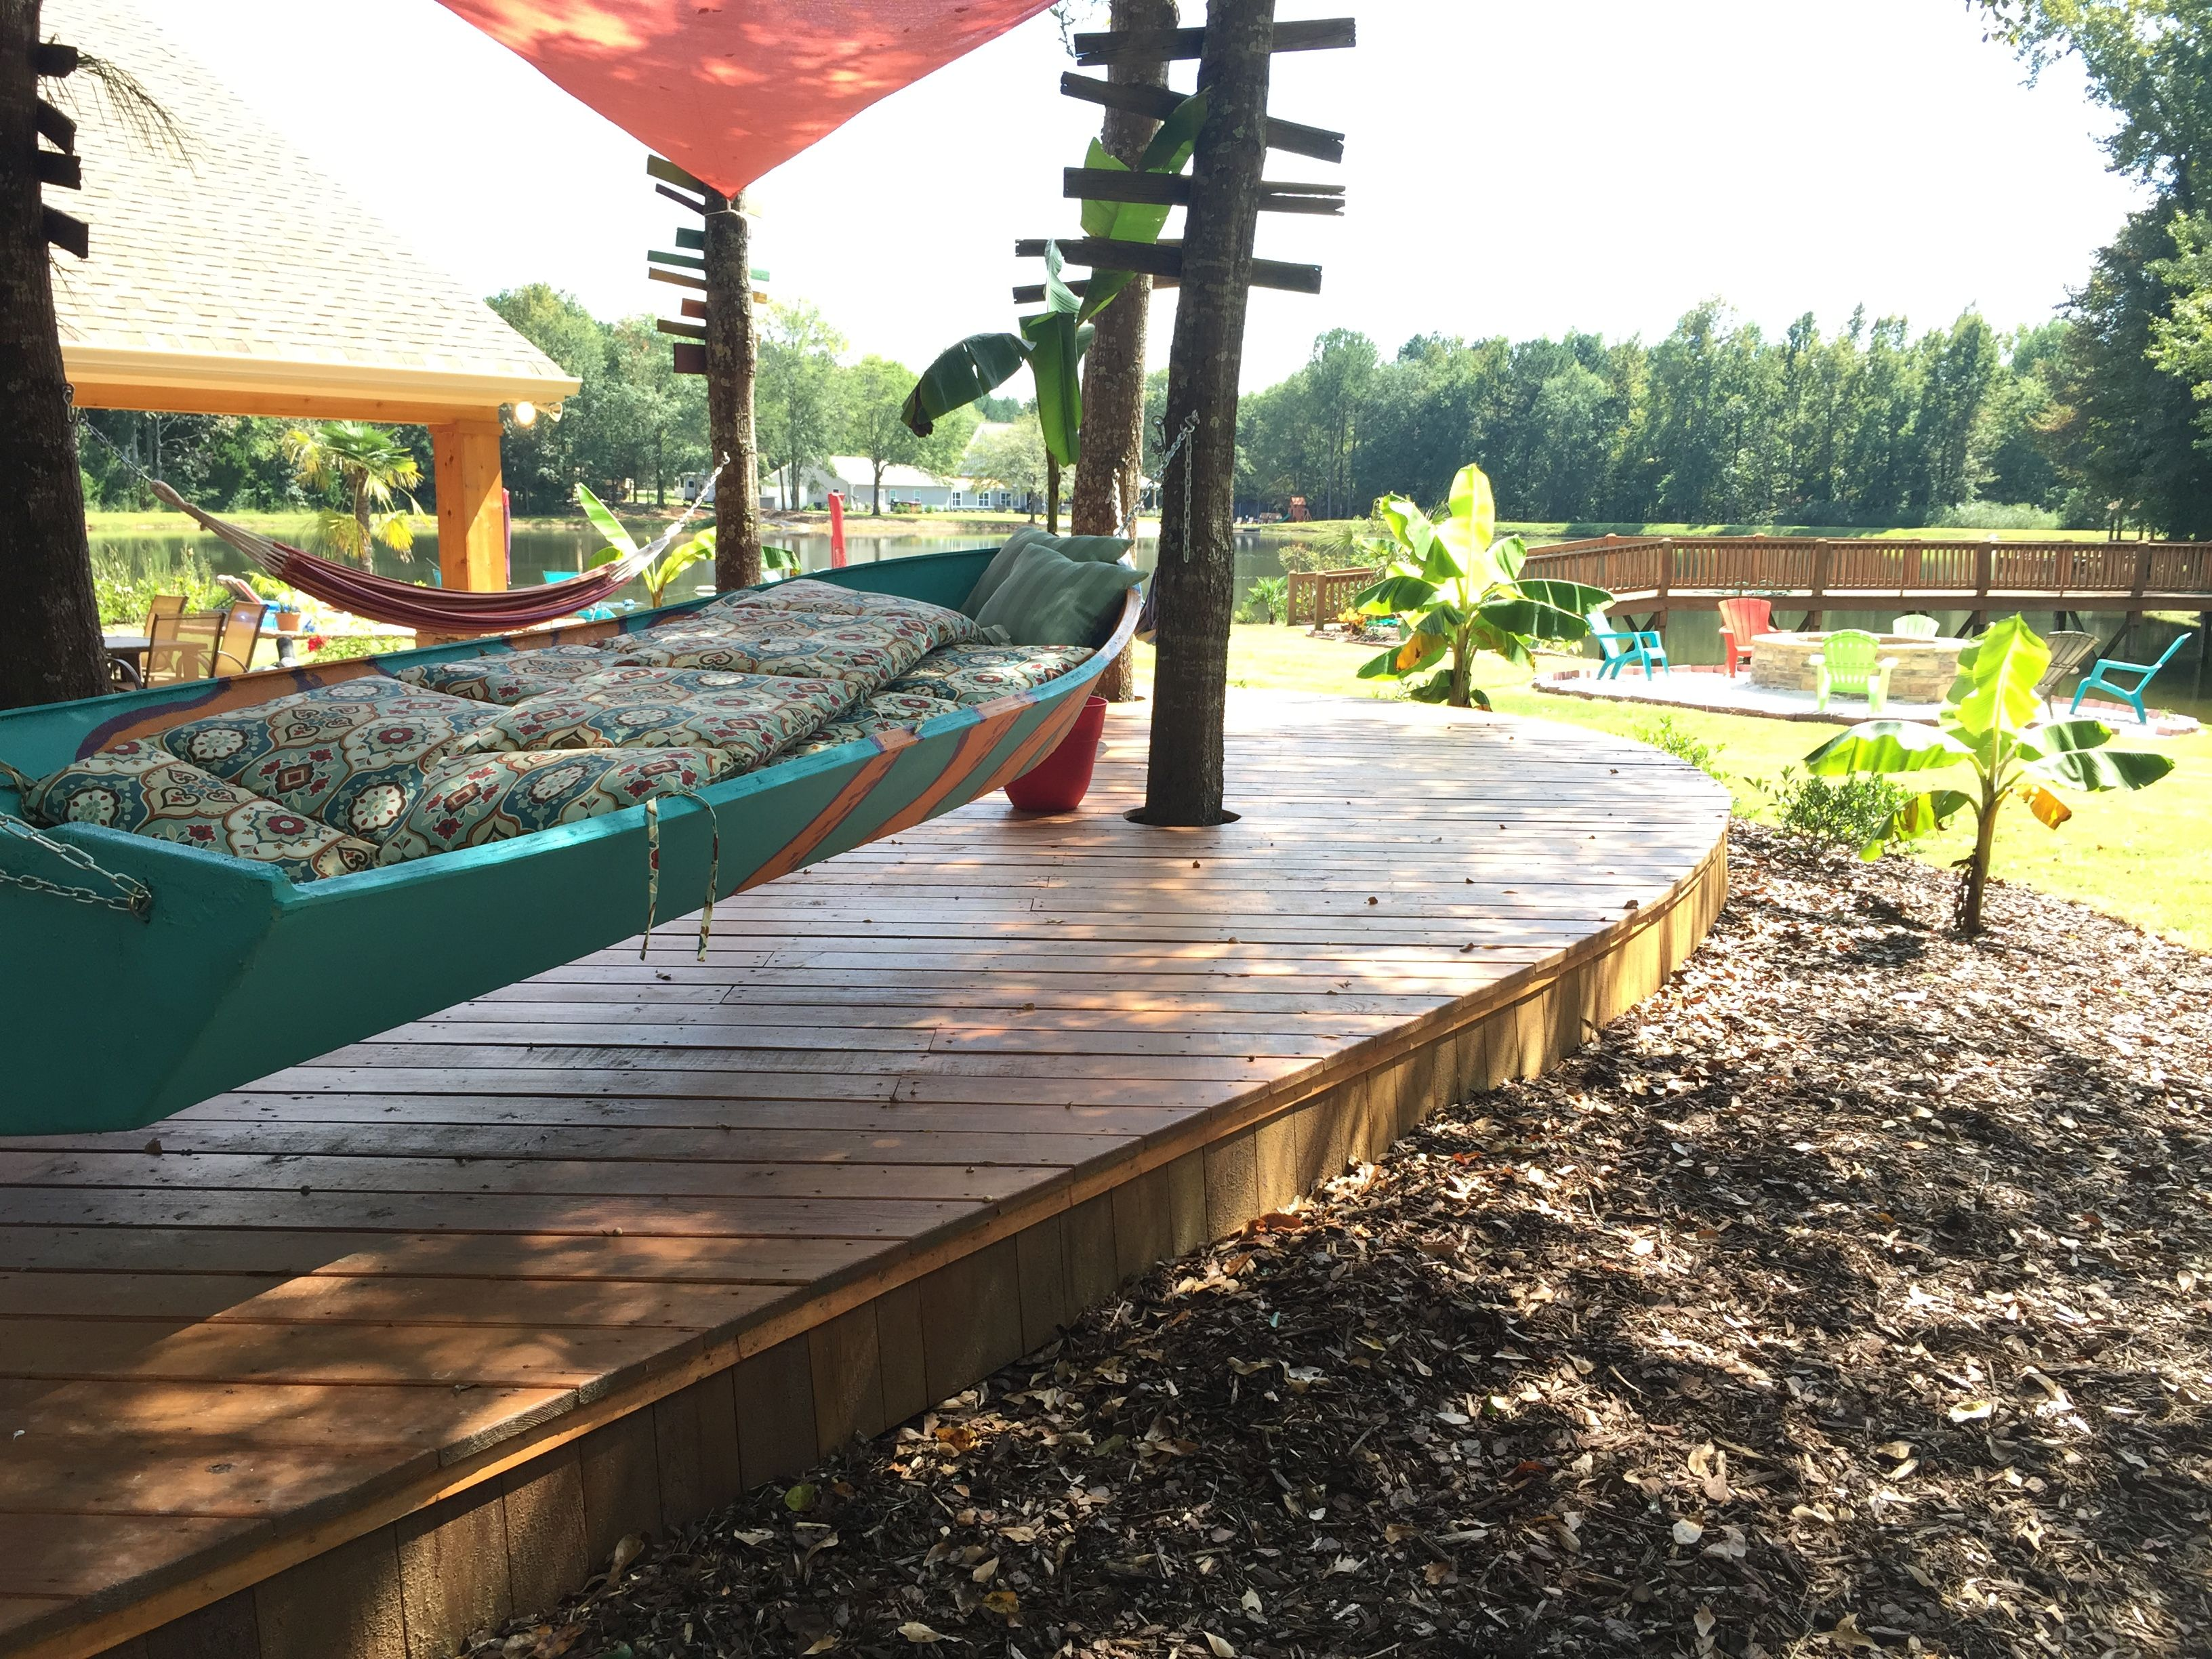 Love the boat hammock swing so tropical a tiki bar looking